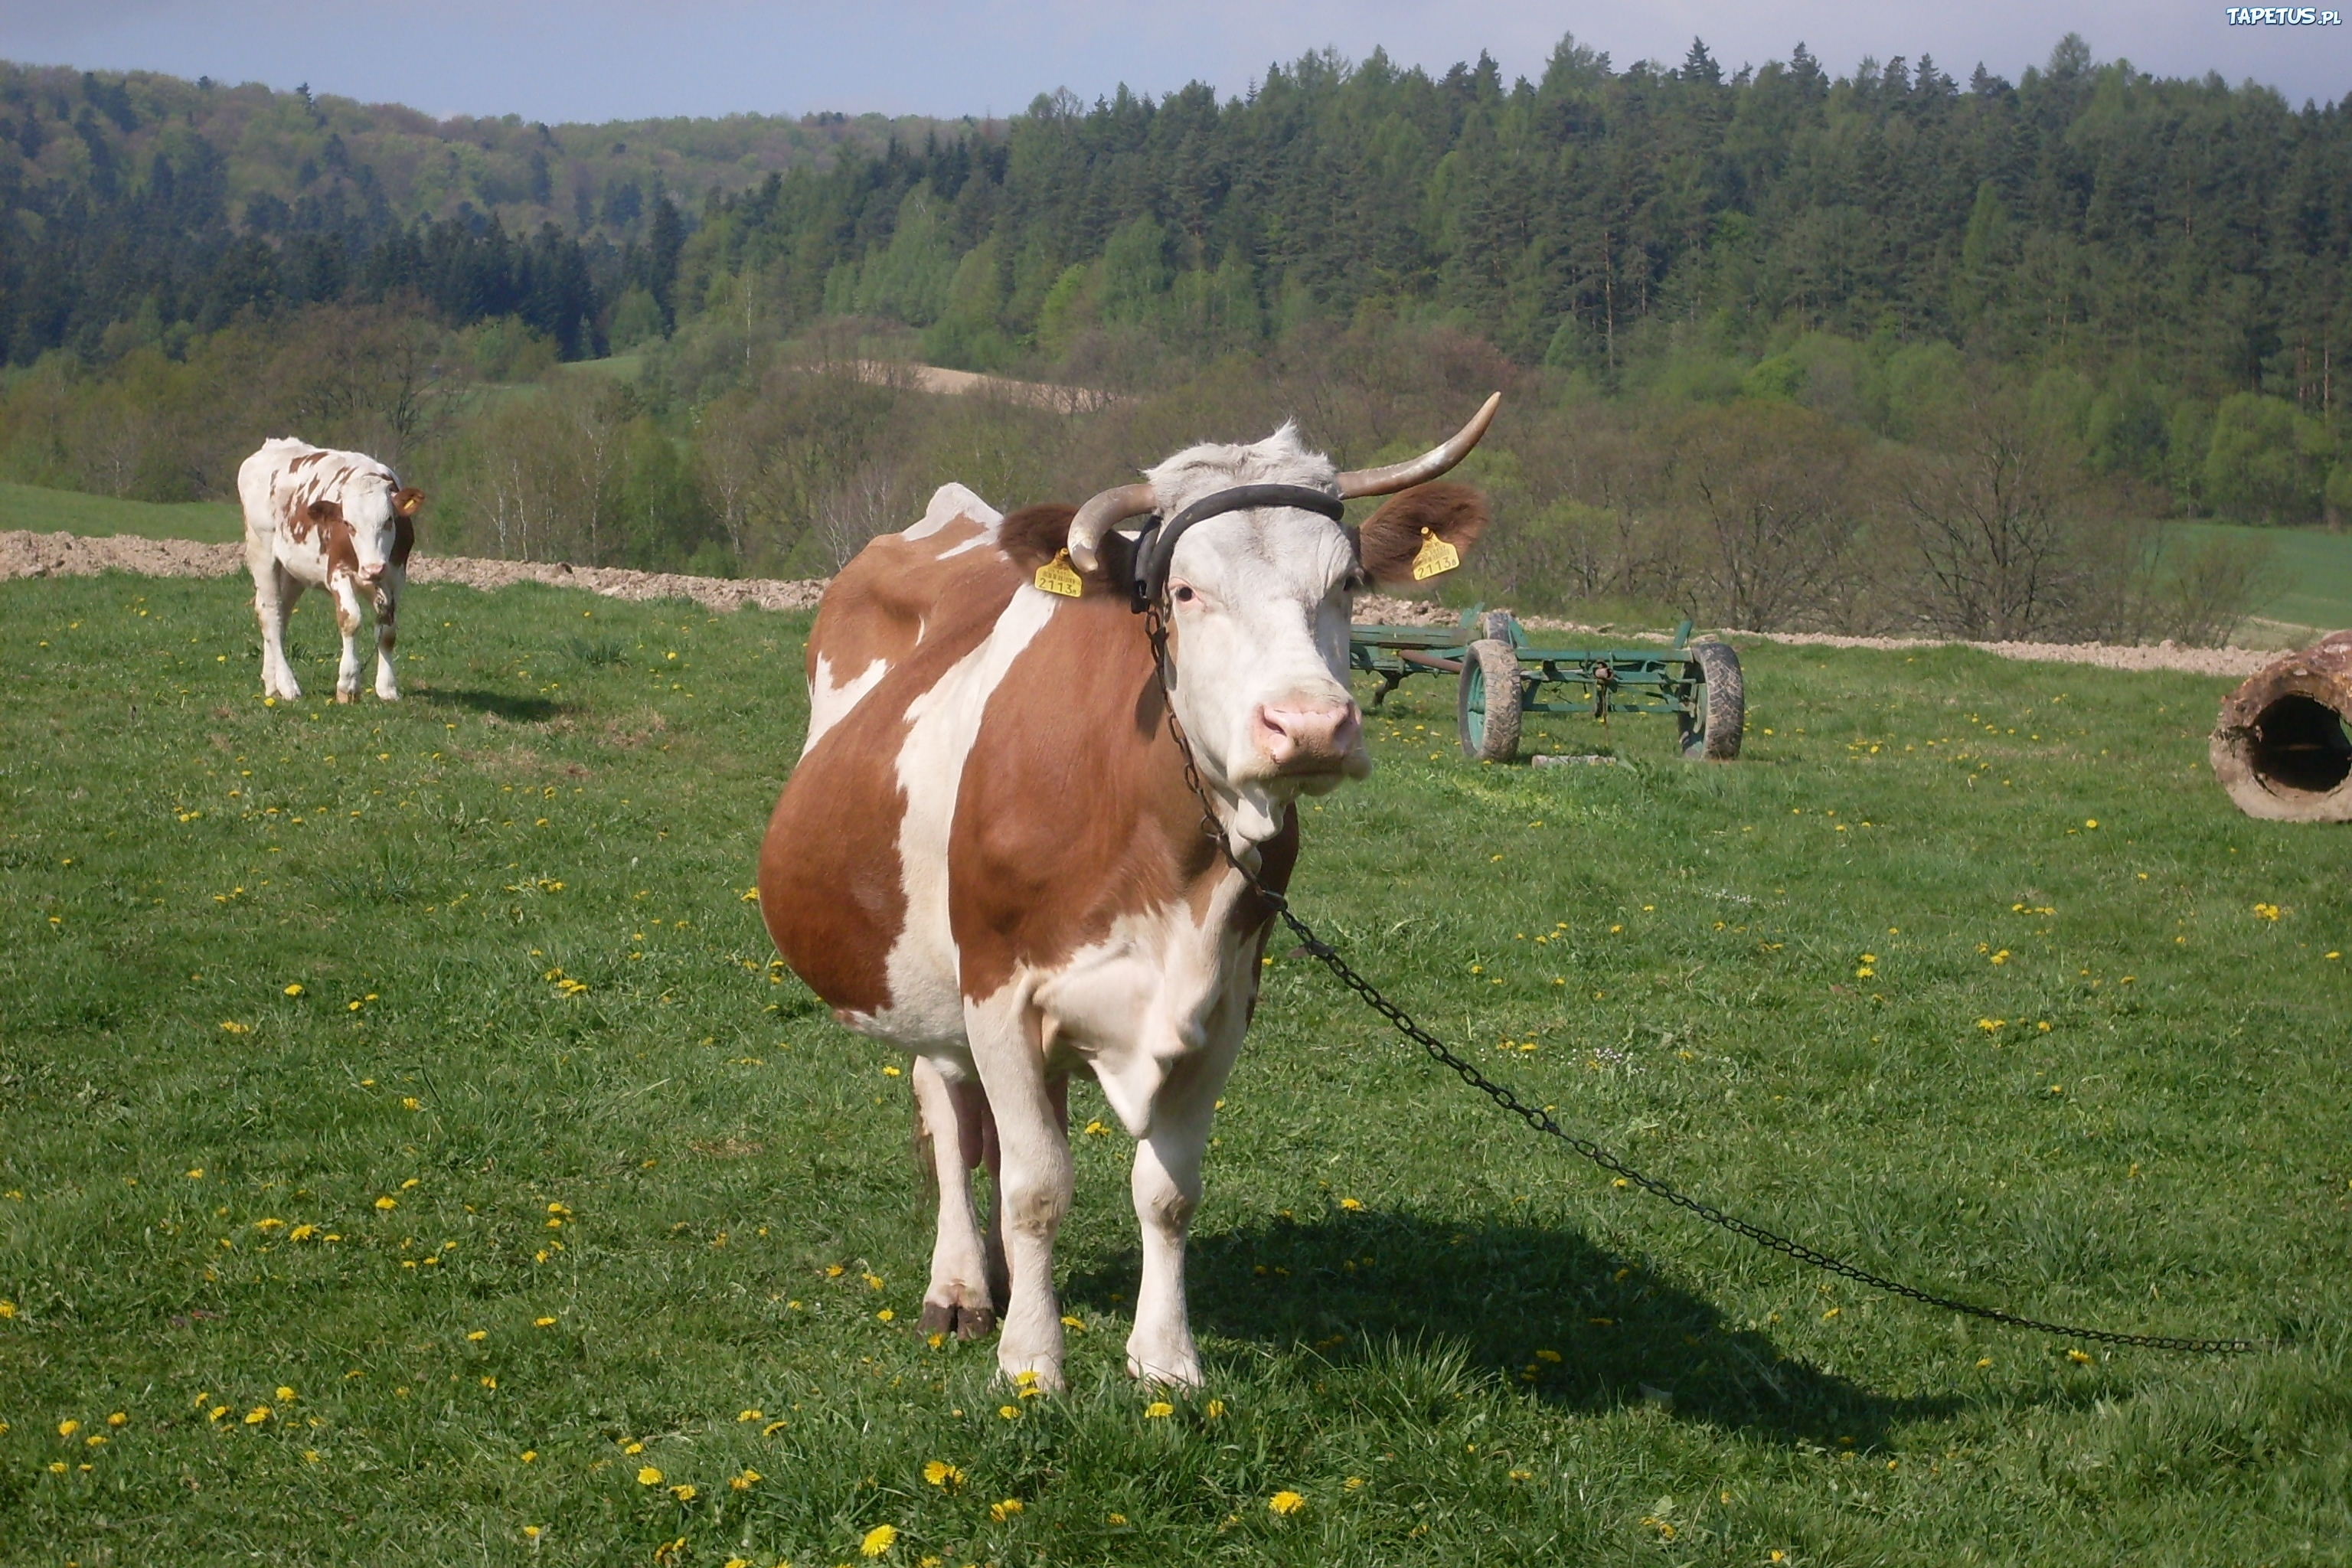 Prank Mechanisms: Kicking Goats and Sleeping Machines